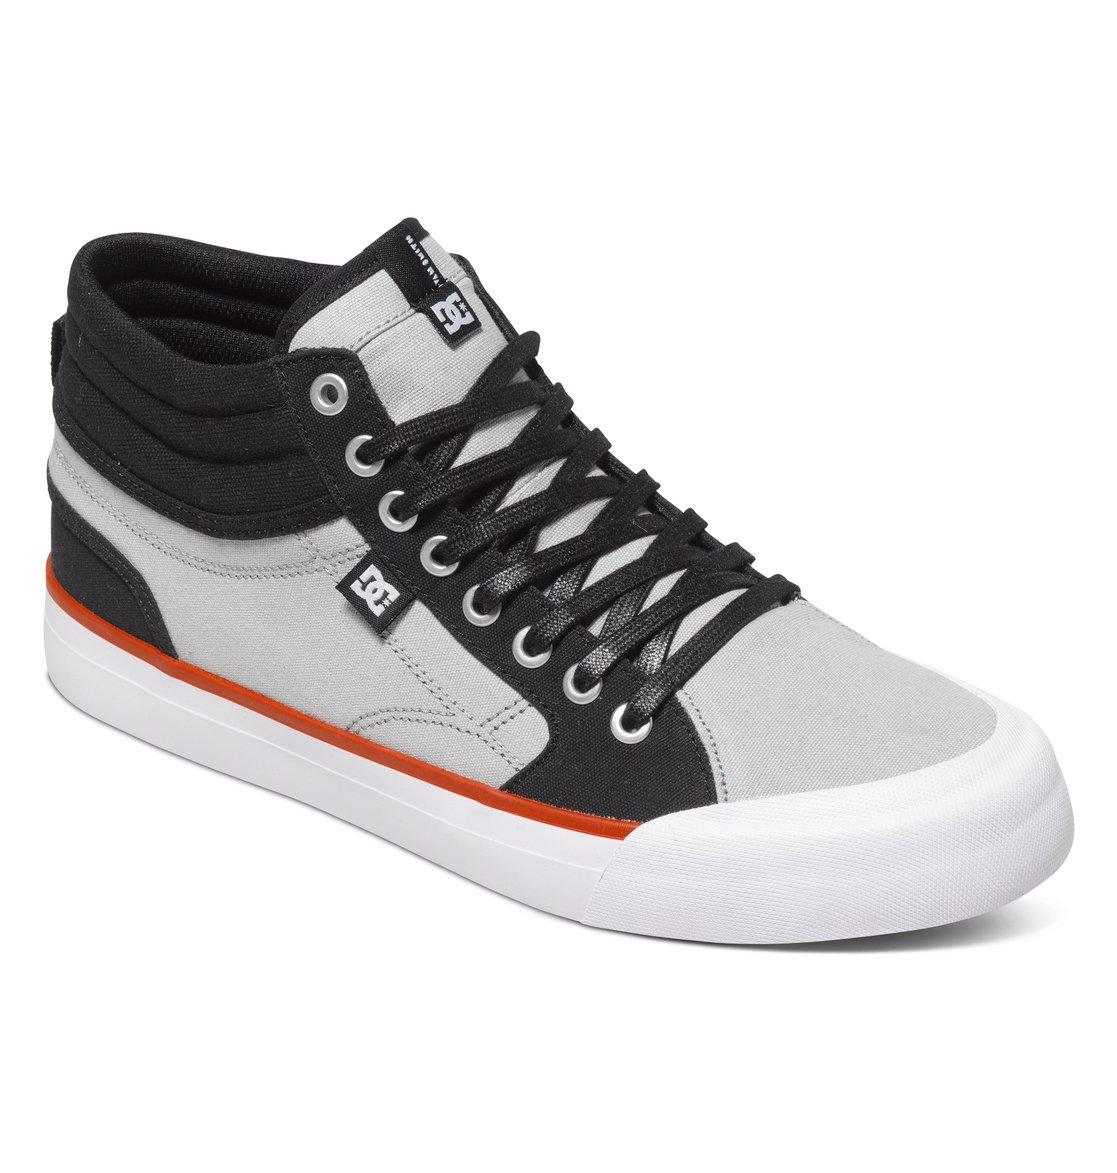 Dc Shoes Mens High Tops Black